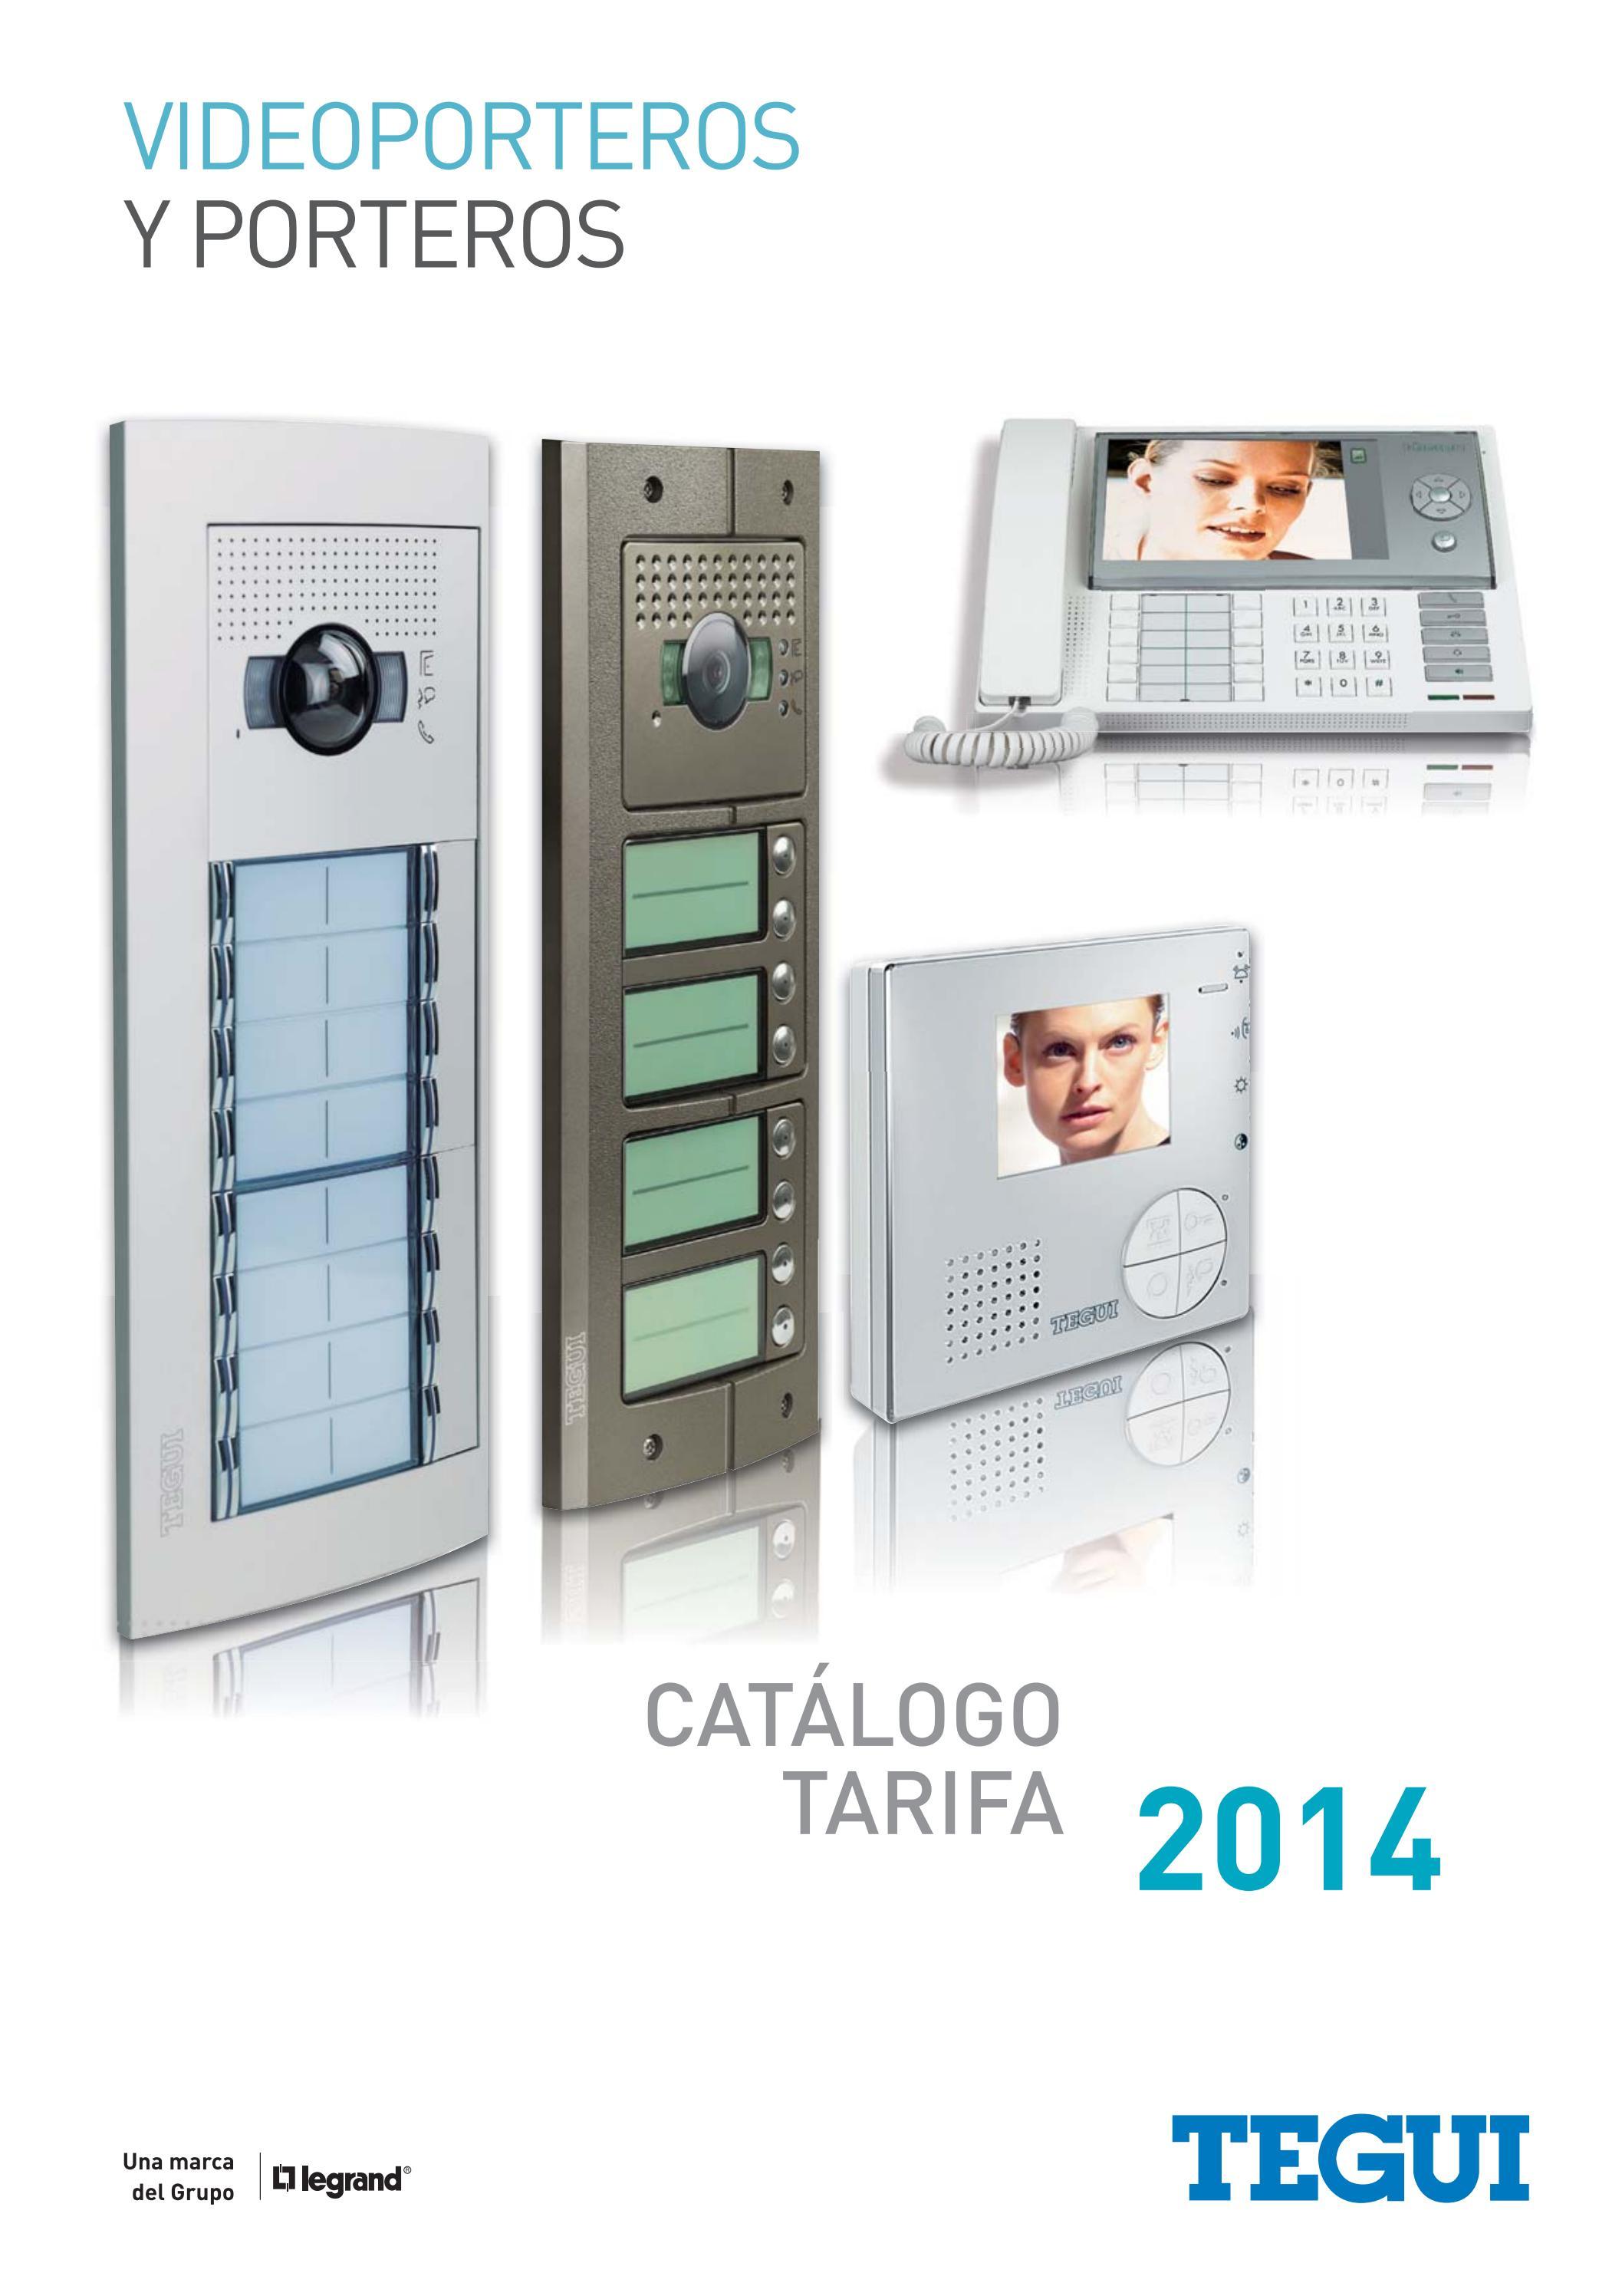 Catalogo Tarifa Videoporteros Porteros Tegui 2014 By Gomez